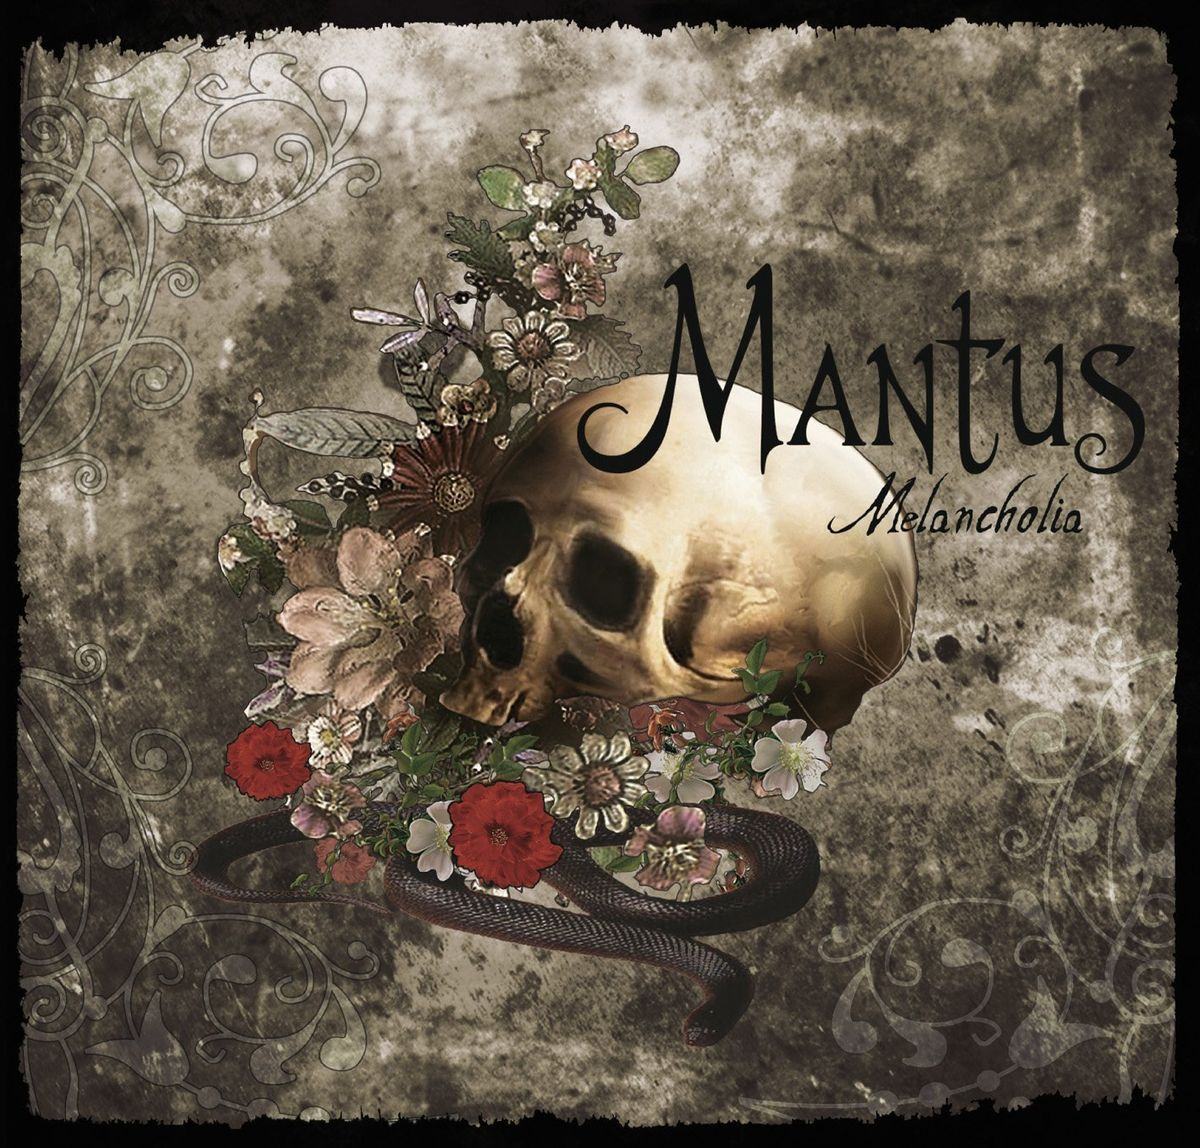 Mantus: Melancholia (2015) Book Cover